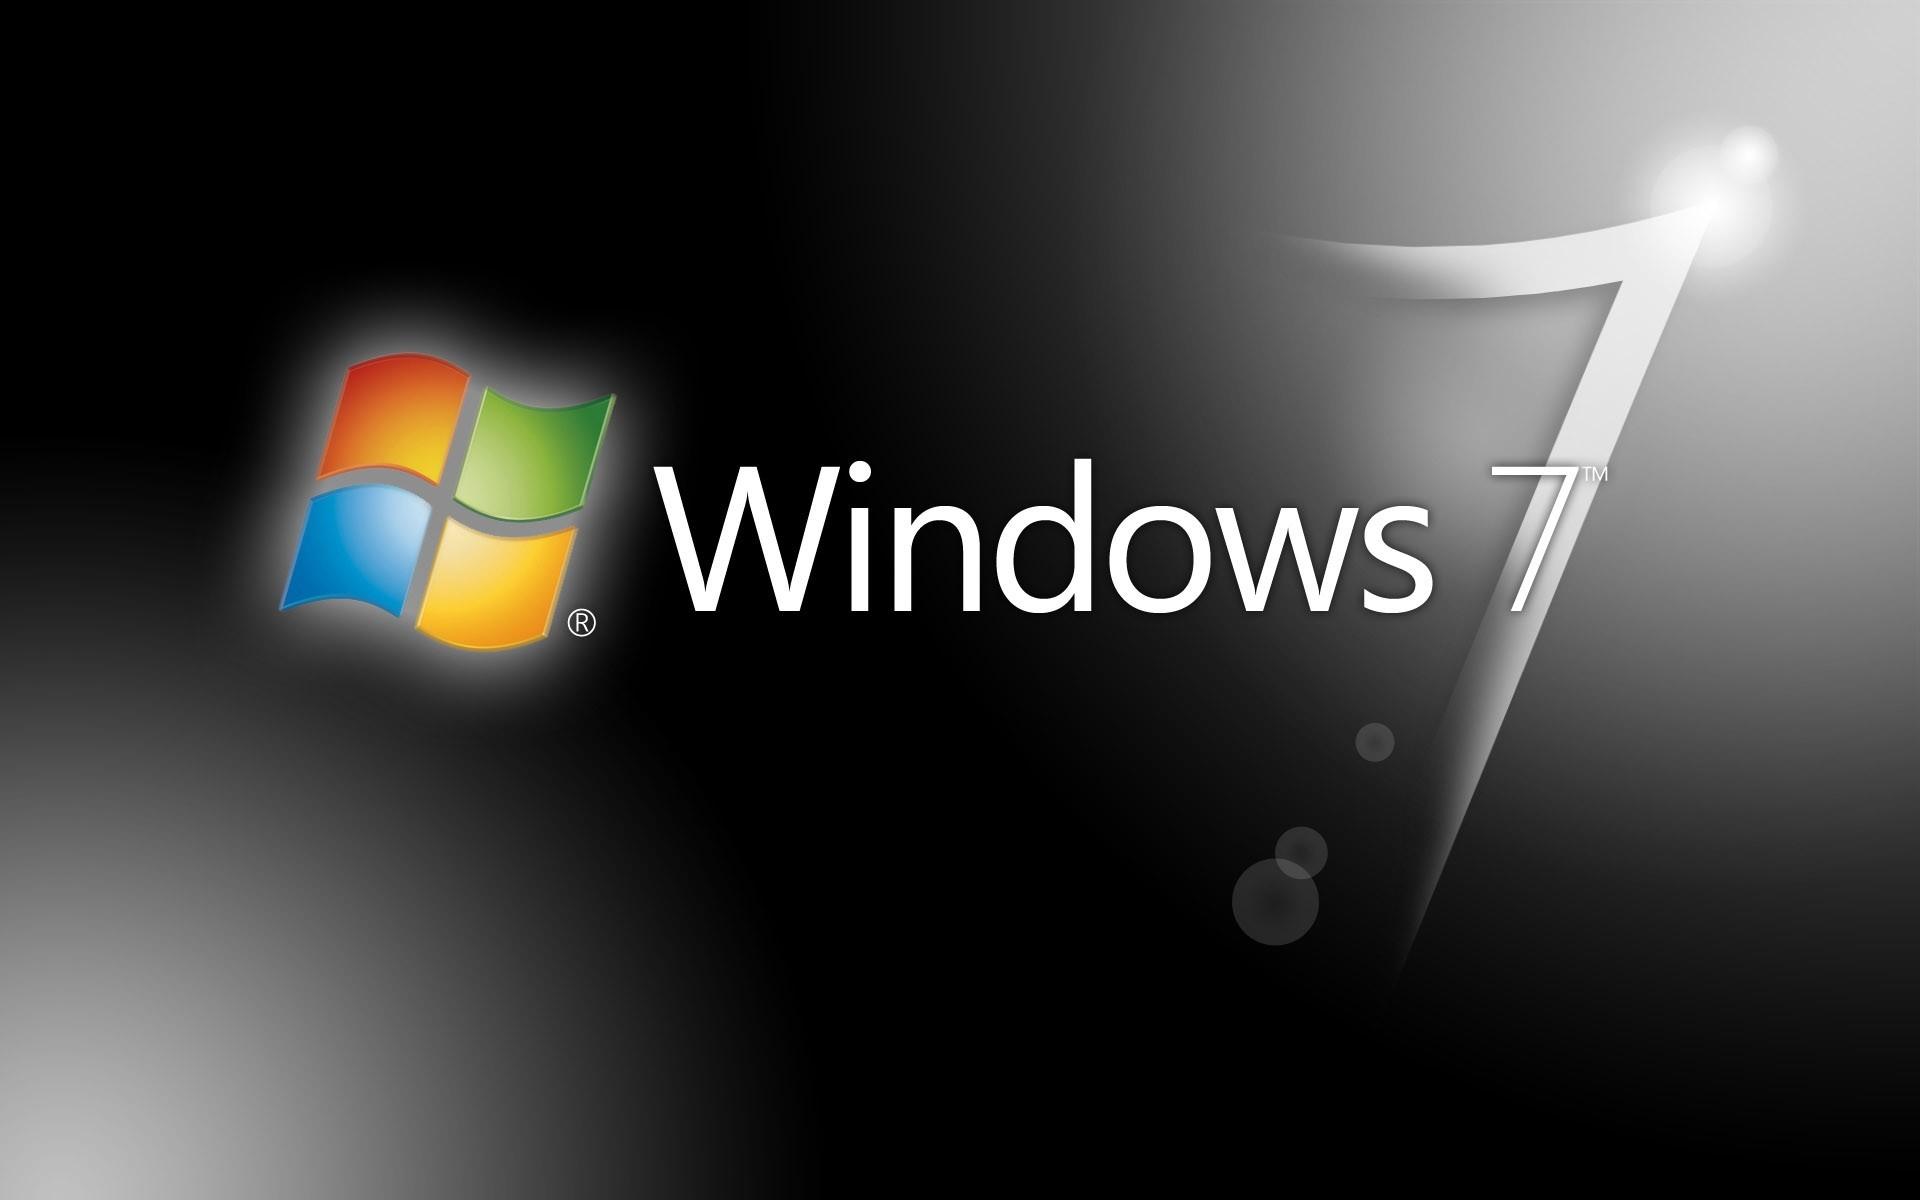 Microsoft Windows HD Background Wallpaper Amazing Wallpaperz 1920×1200 Desktop  Backgrounds For Windows 7 HD